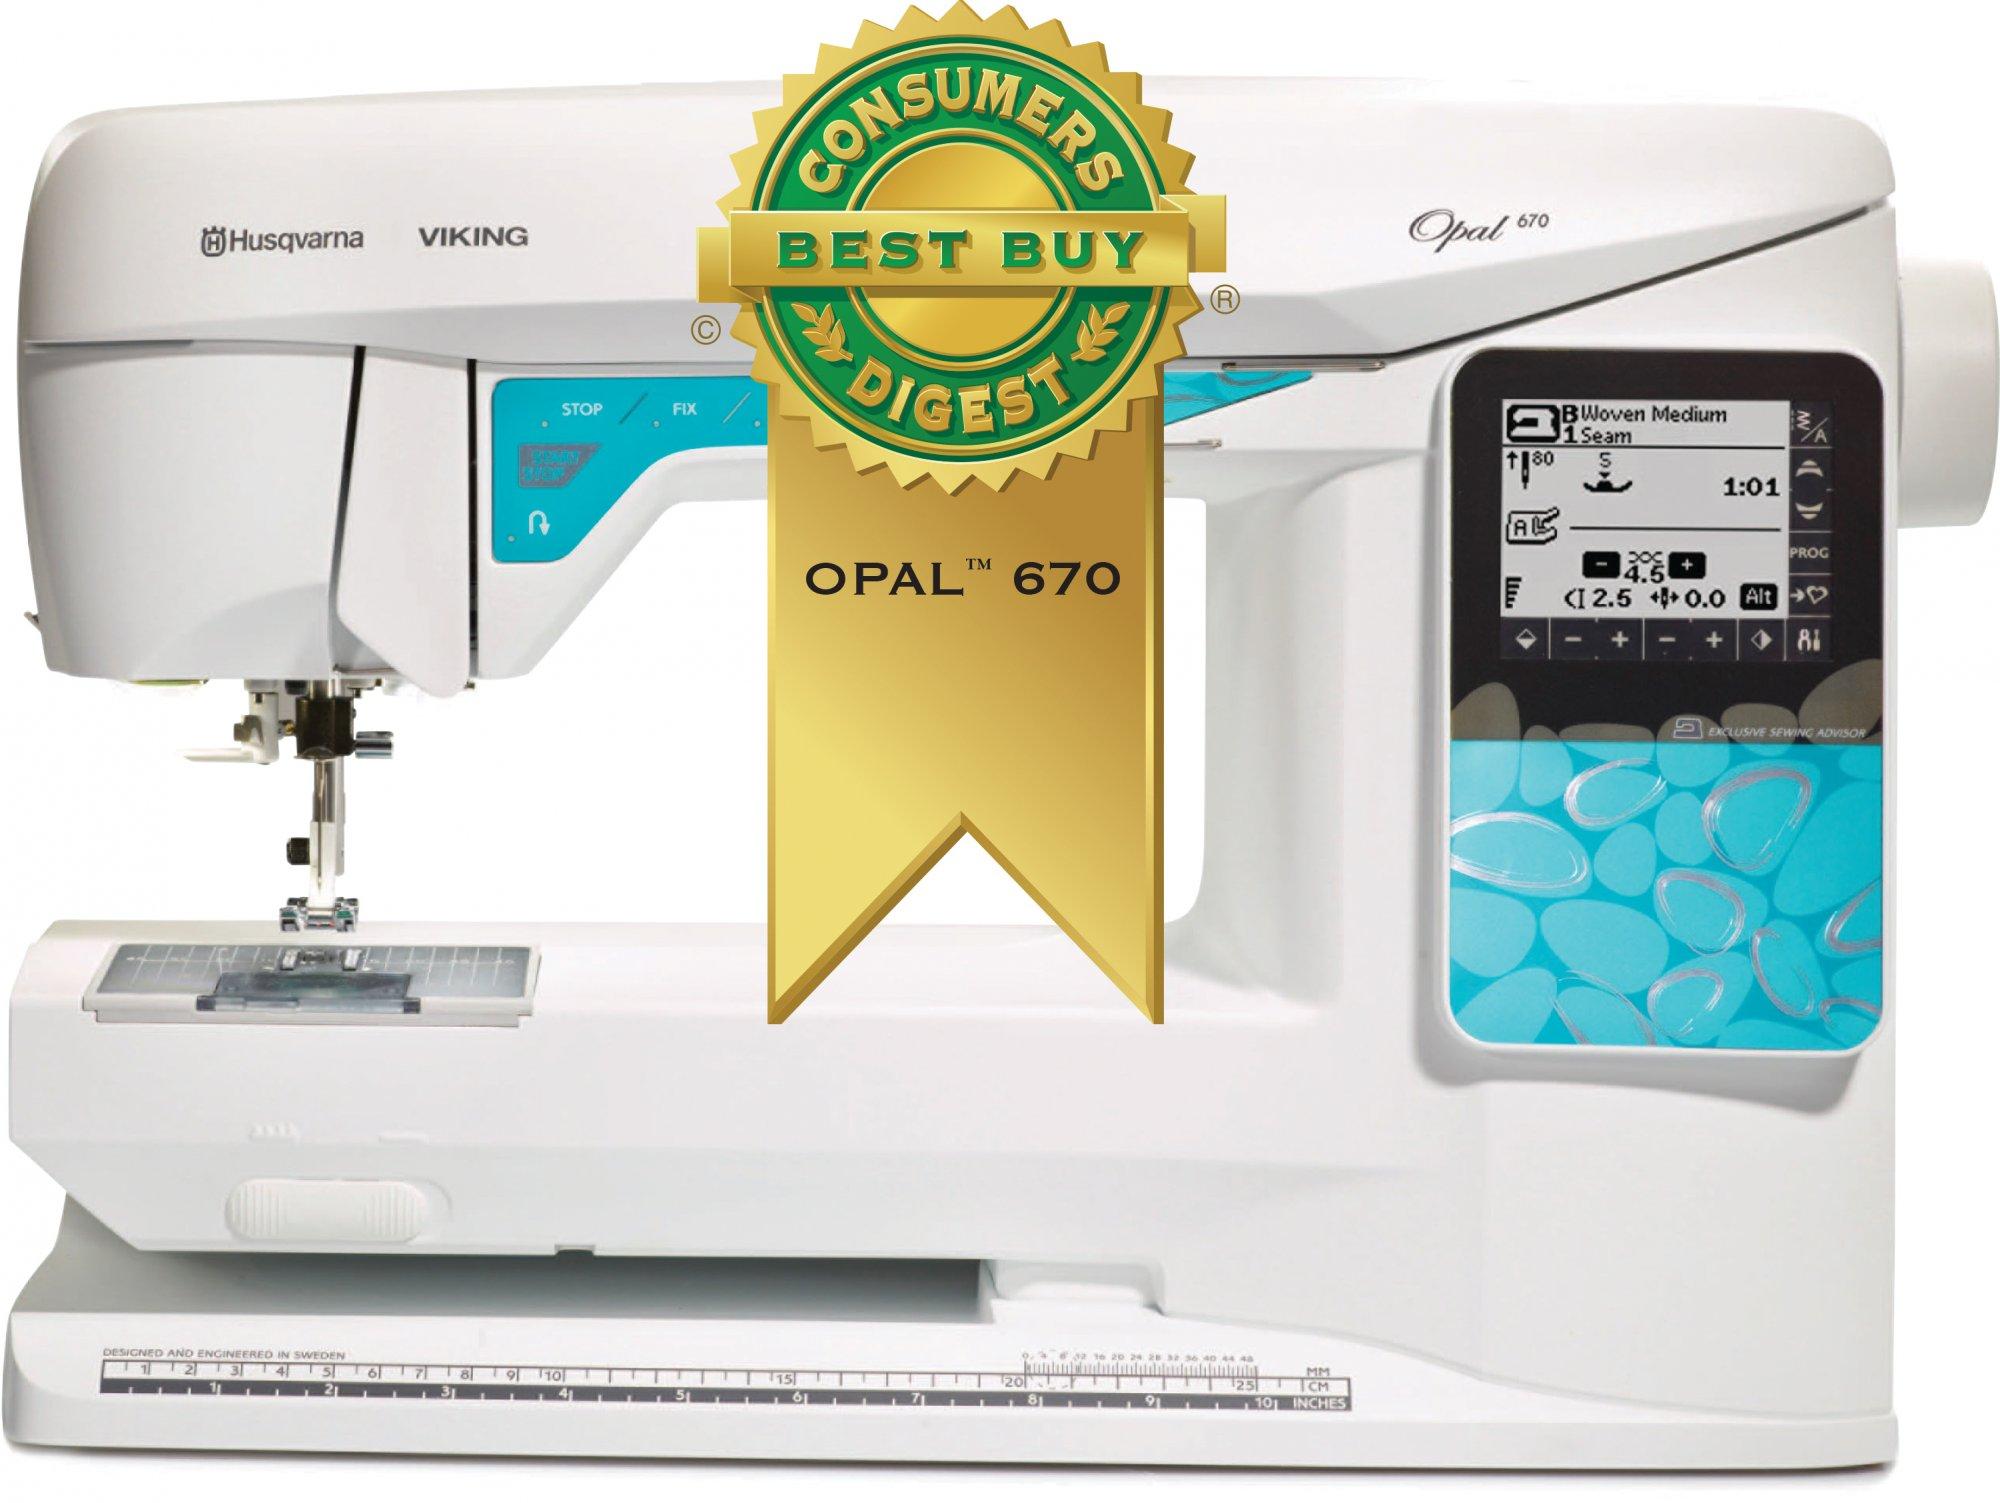 viking opal 670 sewing machine chicago illinois